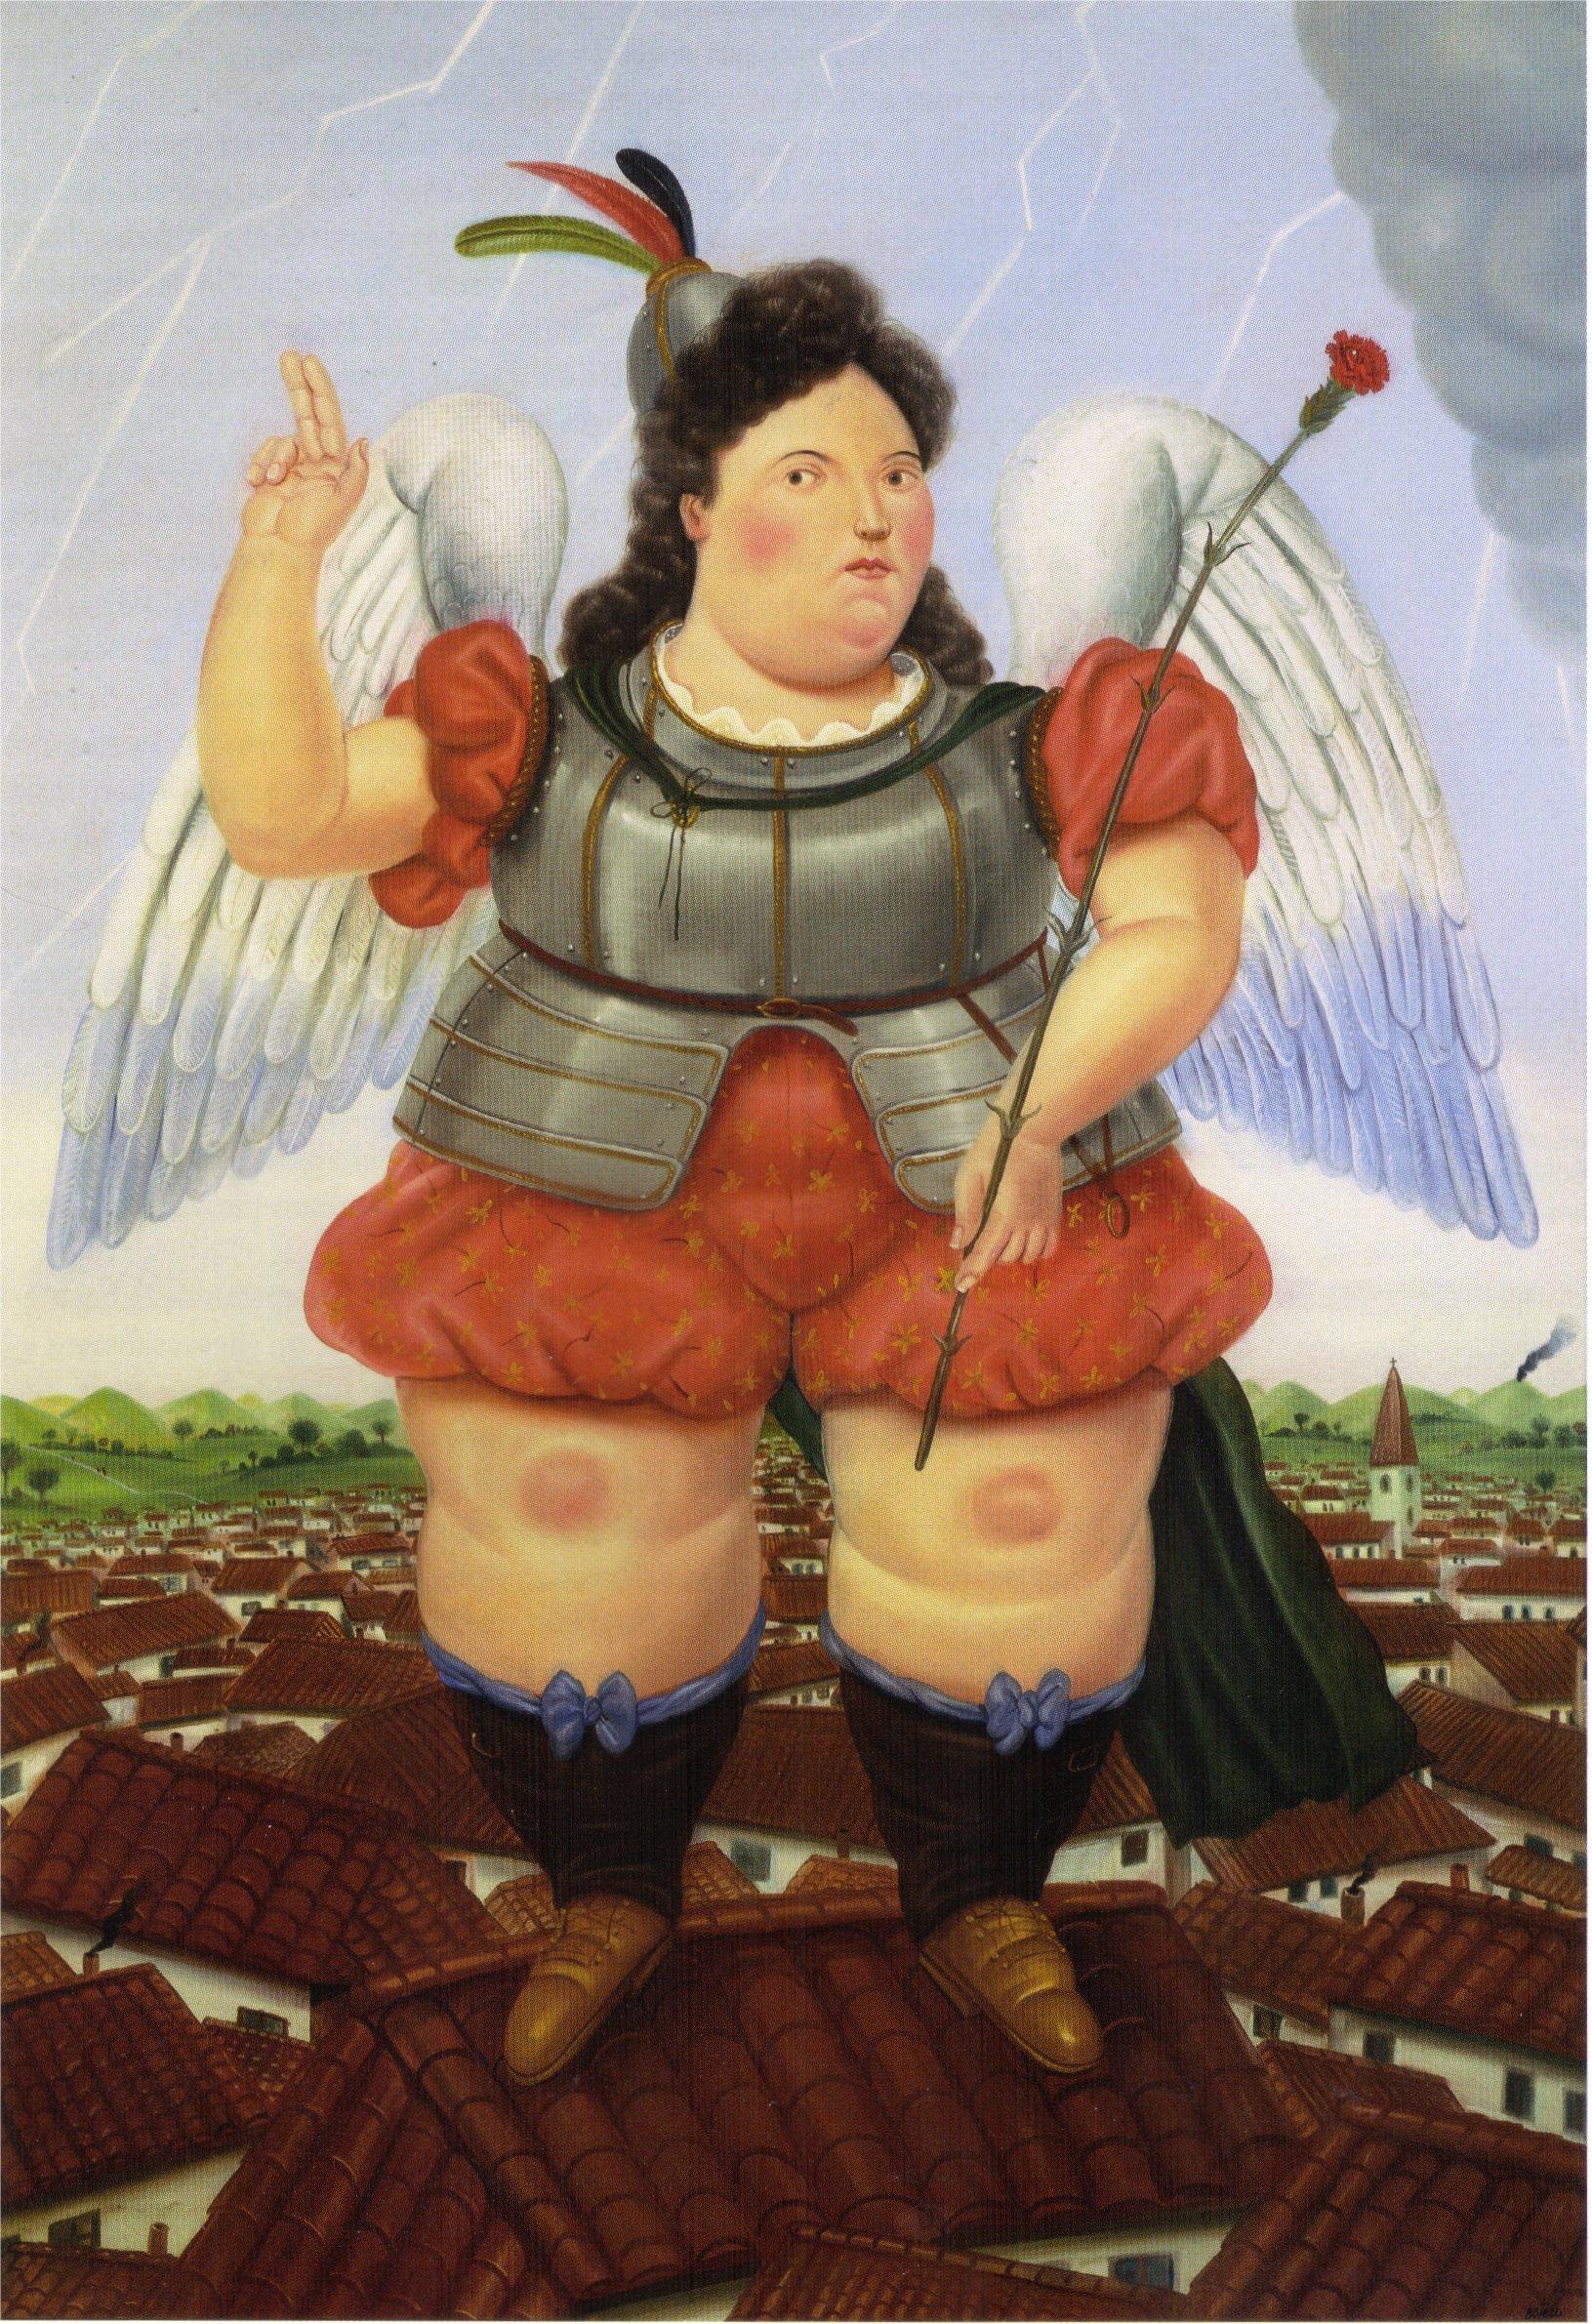 Célèbre Archangel, 1986 - Fernando Botero - WikiArt.org YZ23